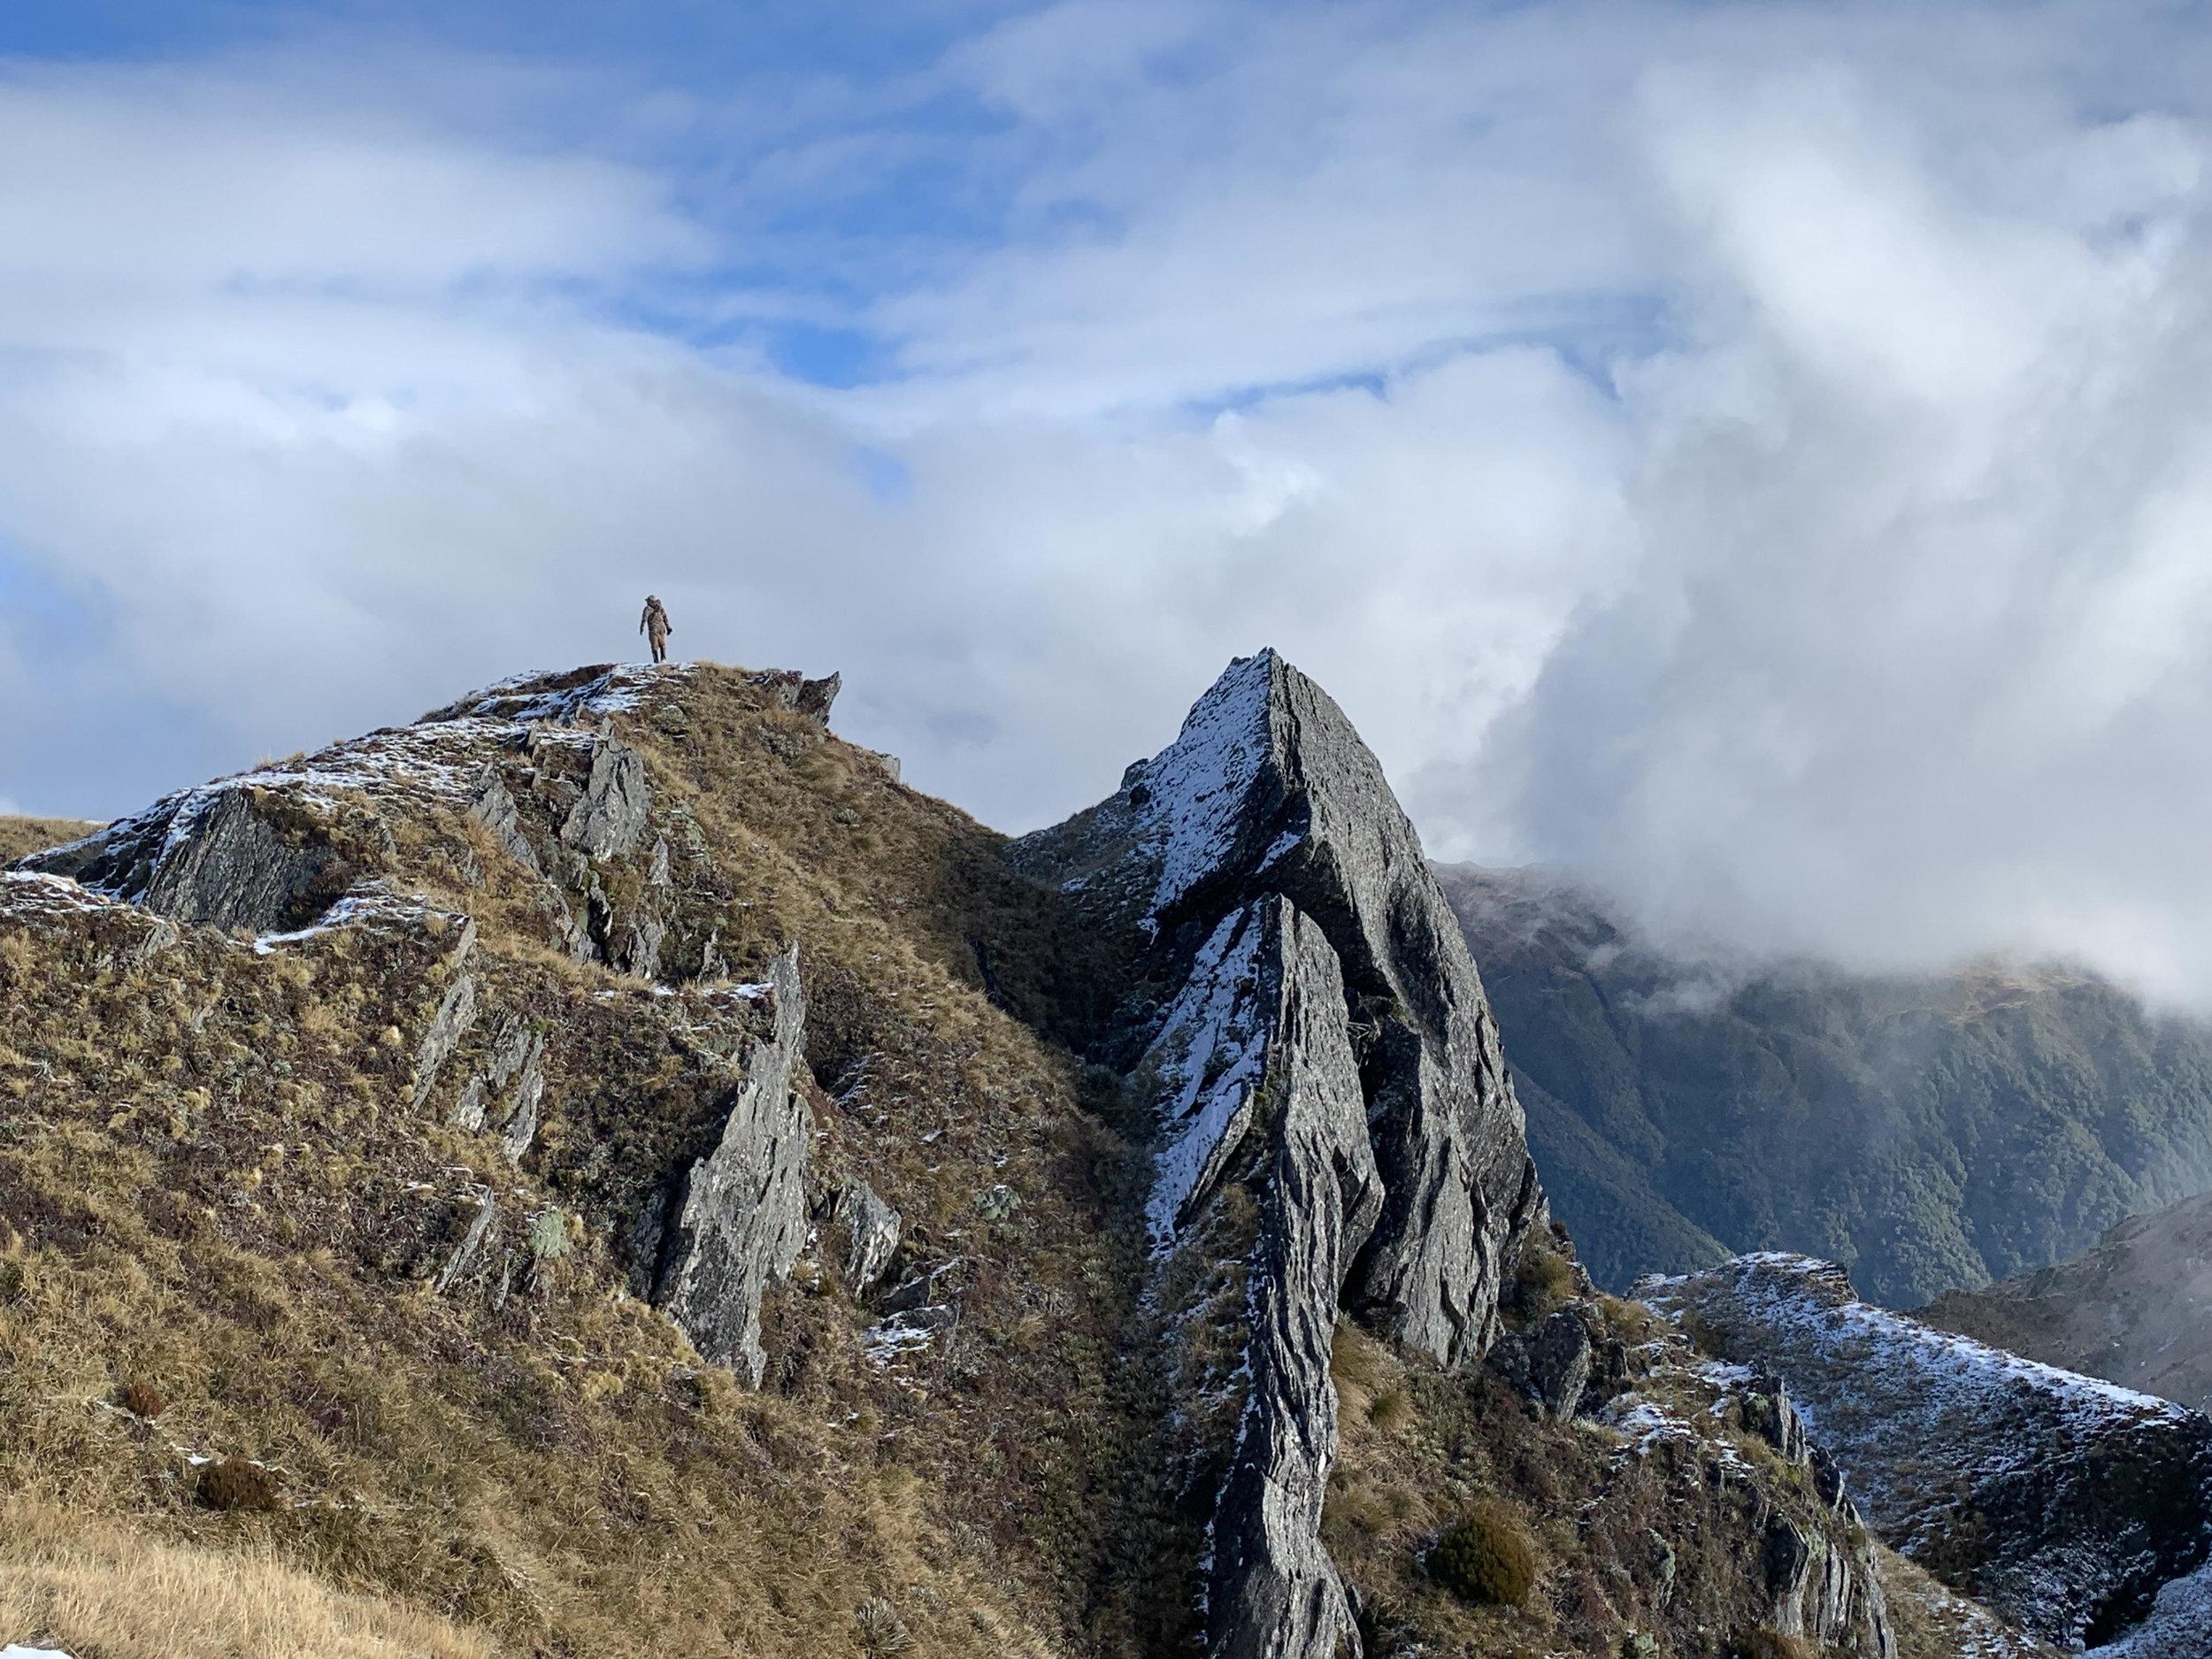 hunter standing on a ridge first lite